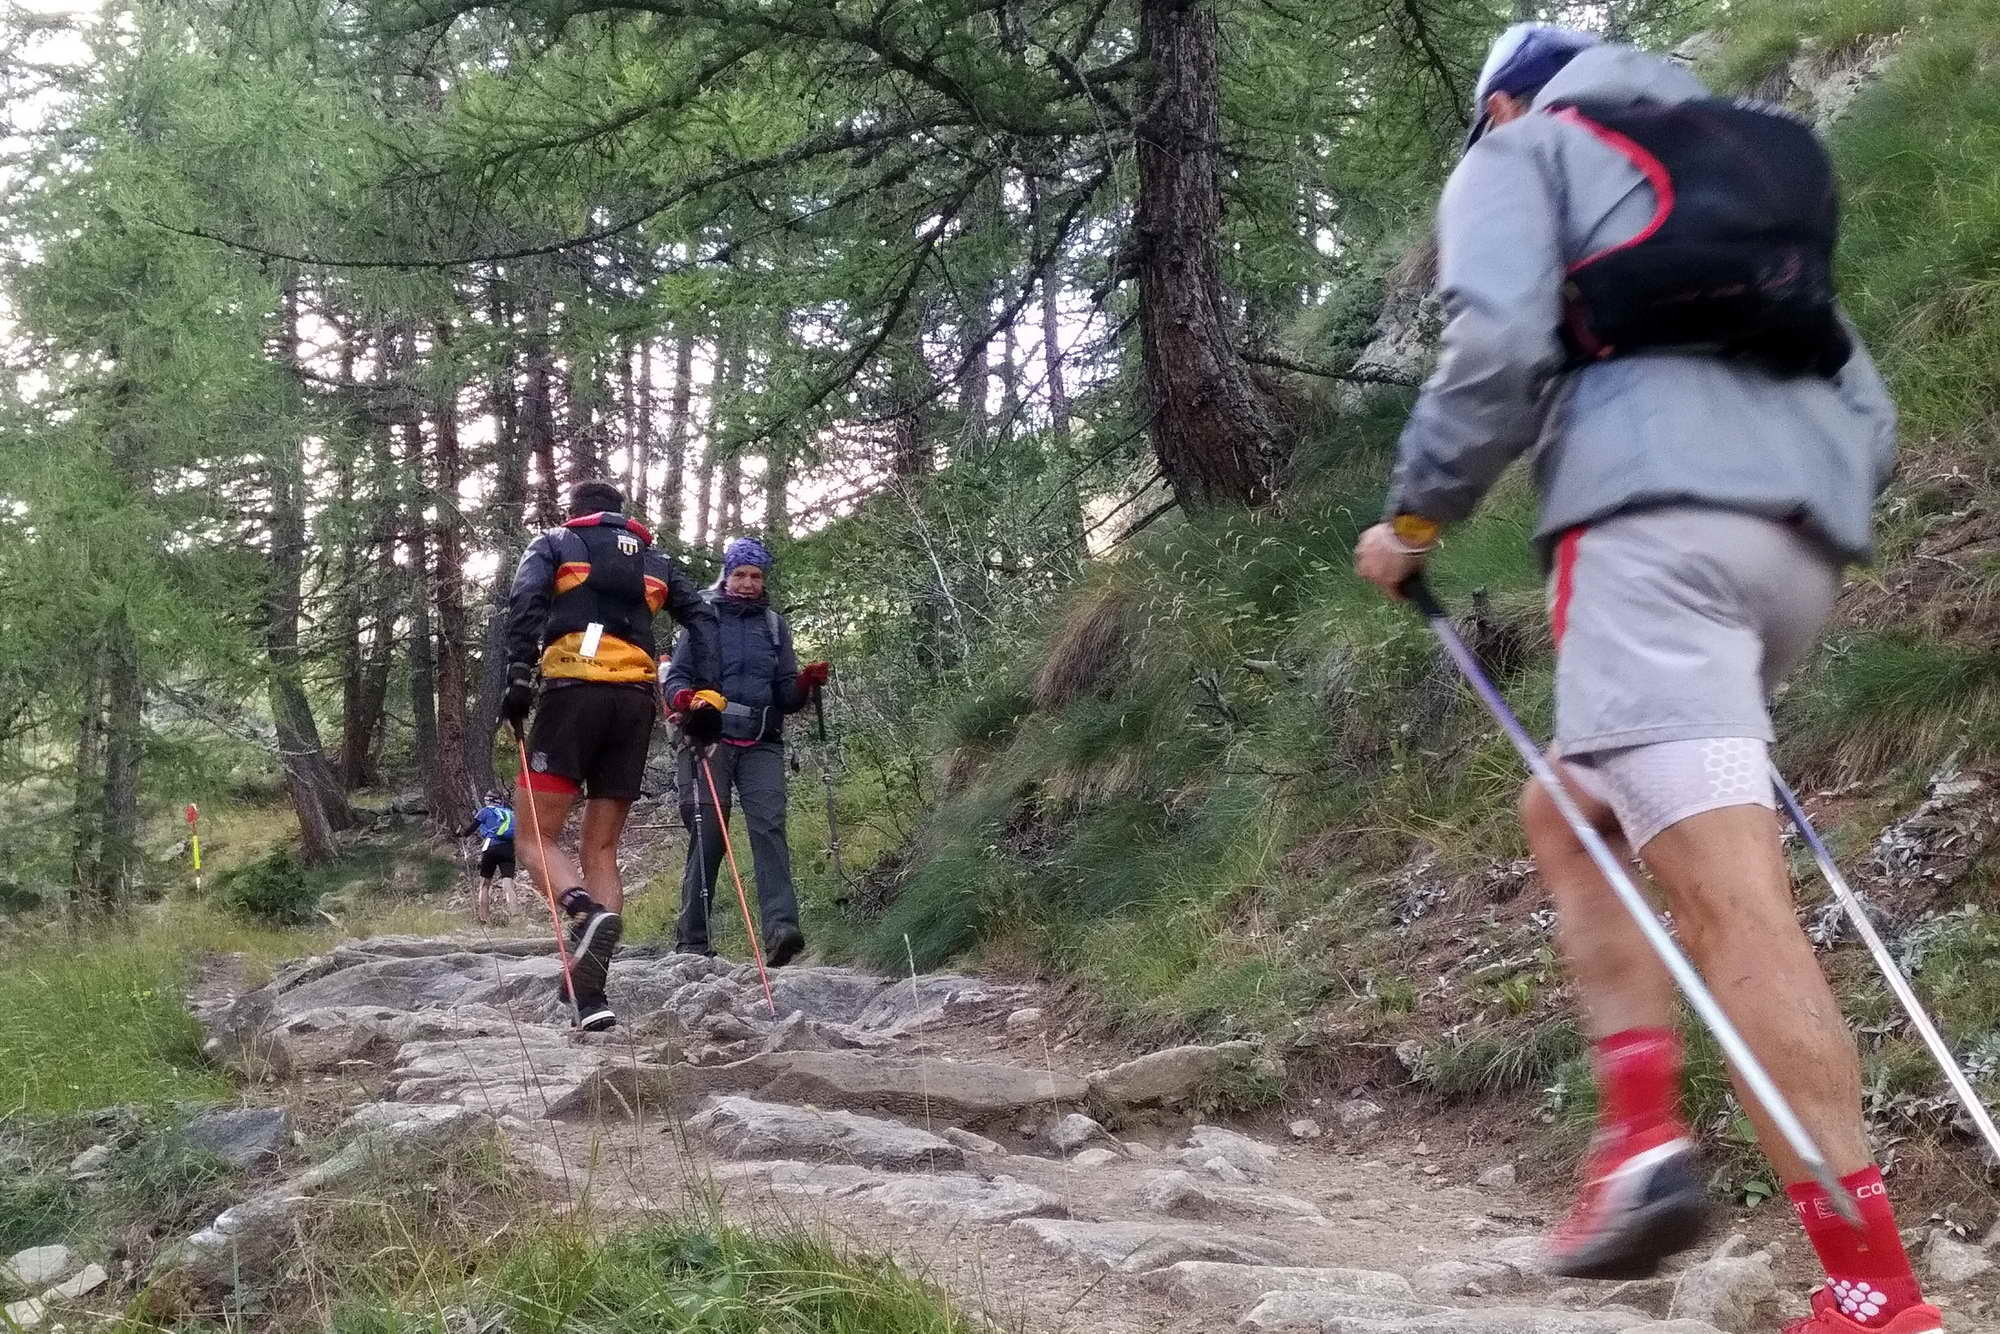 MT 10.5 Rifugio Bertone > Courmayeur > Rifugio Maison Vieille (Aosta, TMB)